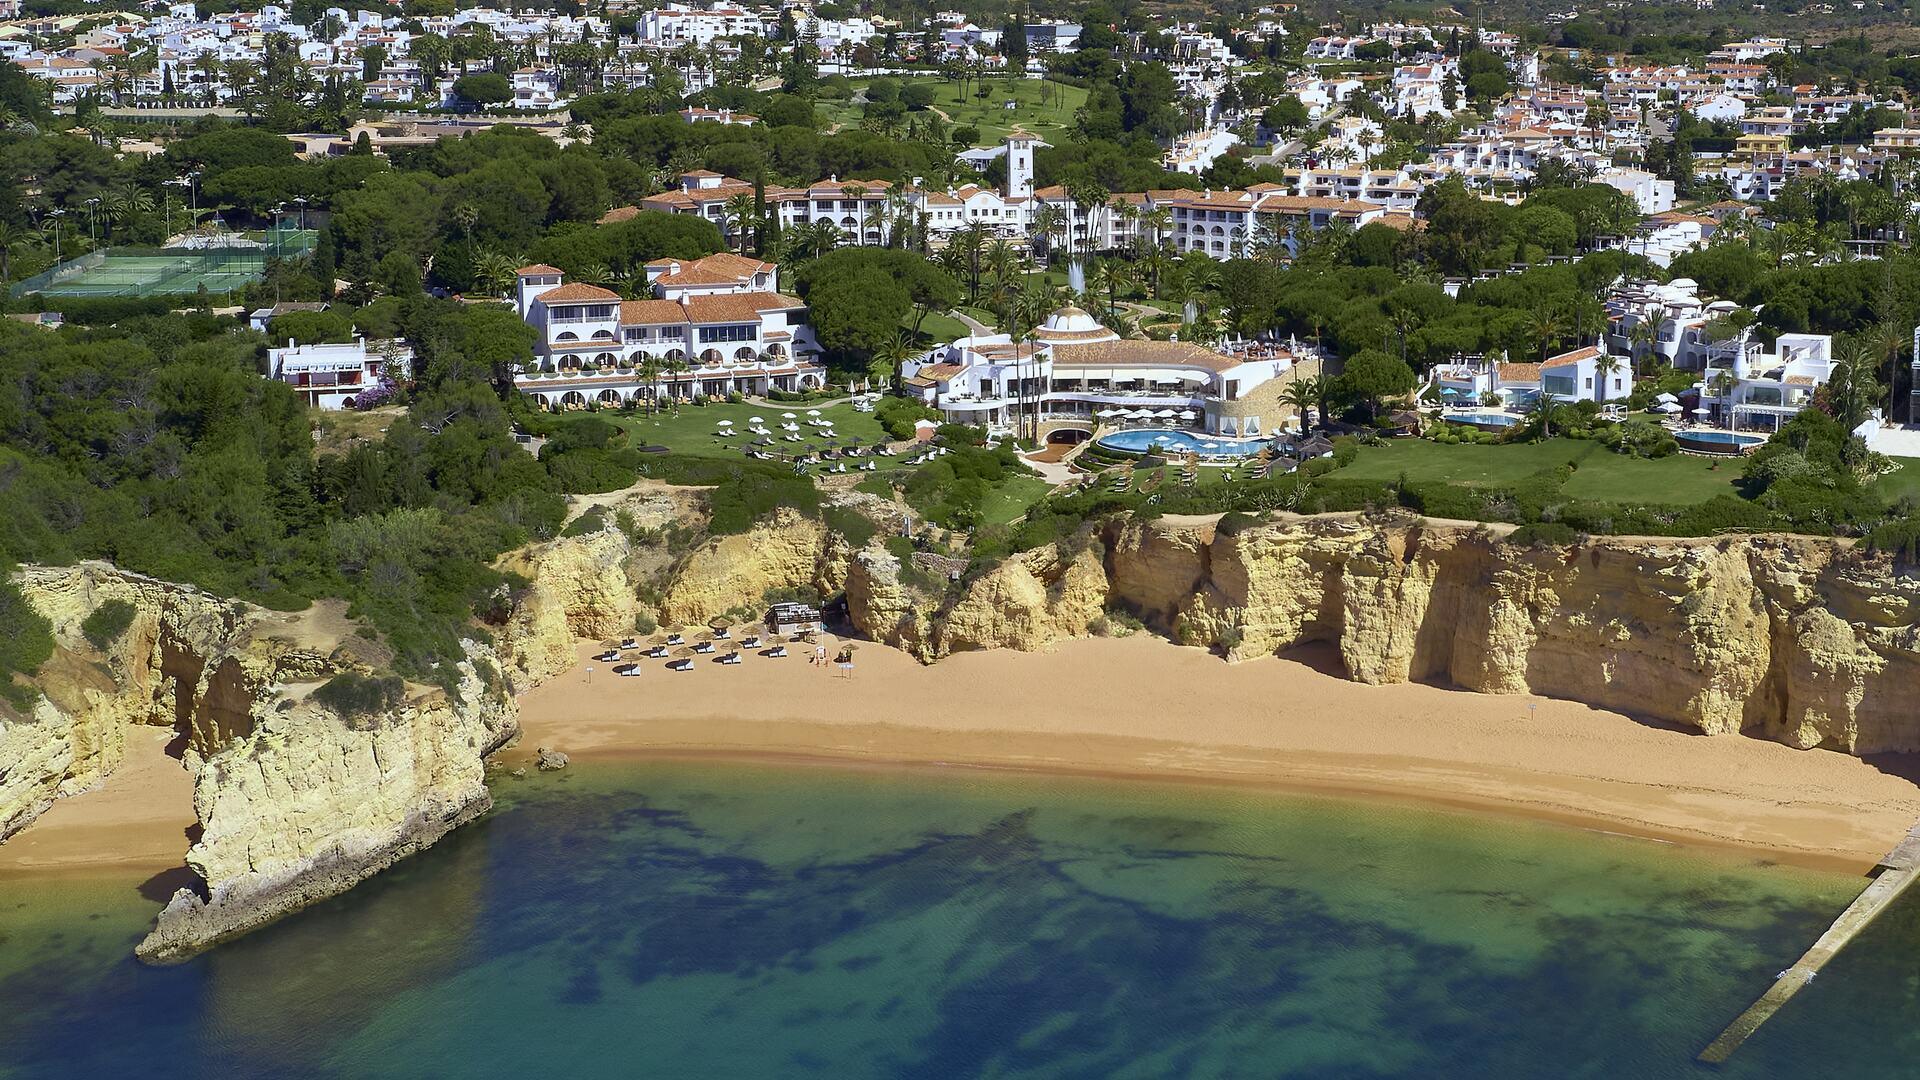 Vila Vita Parc aerial view.